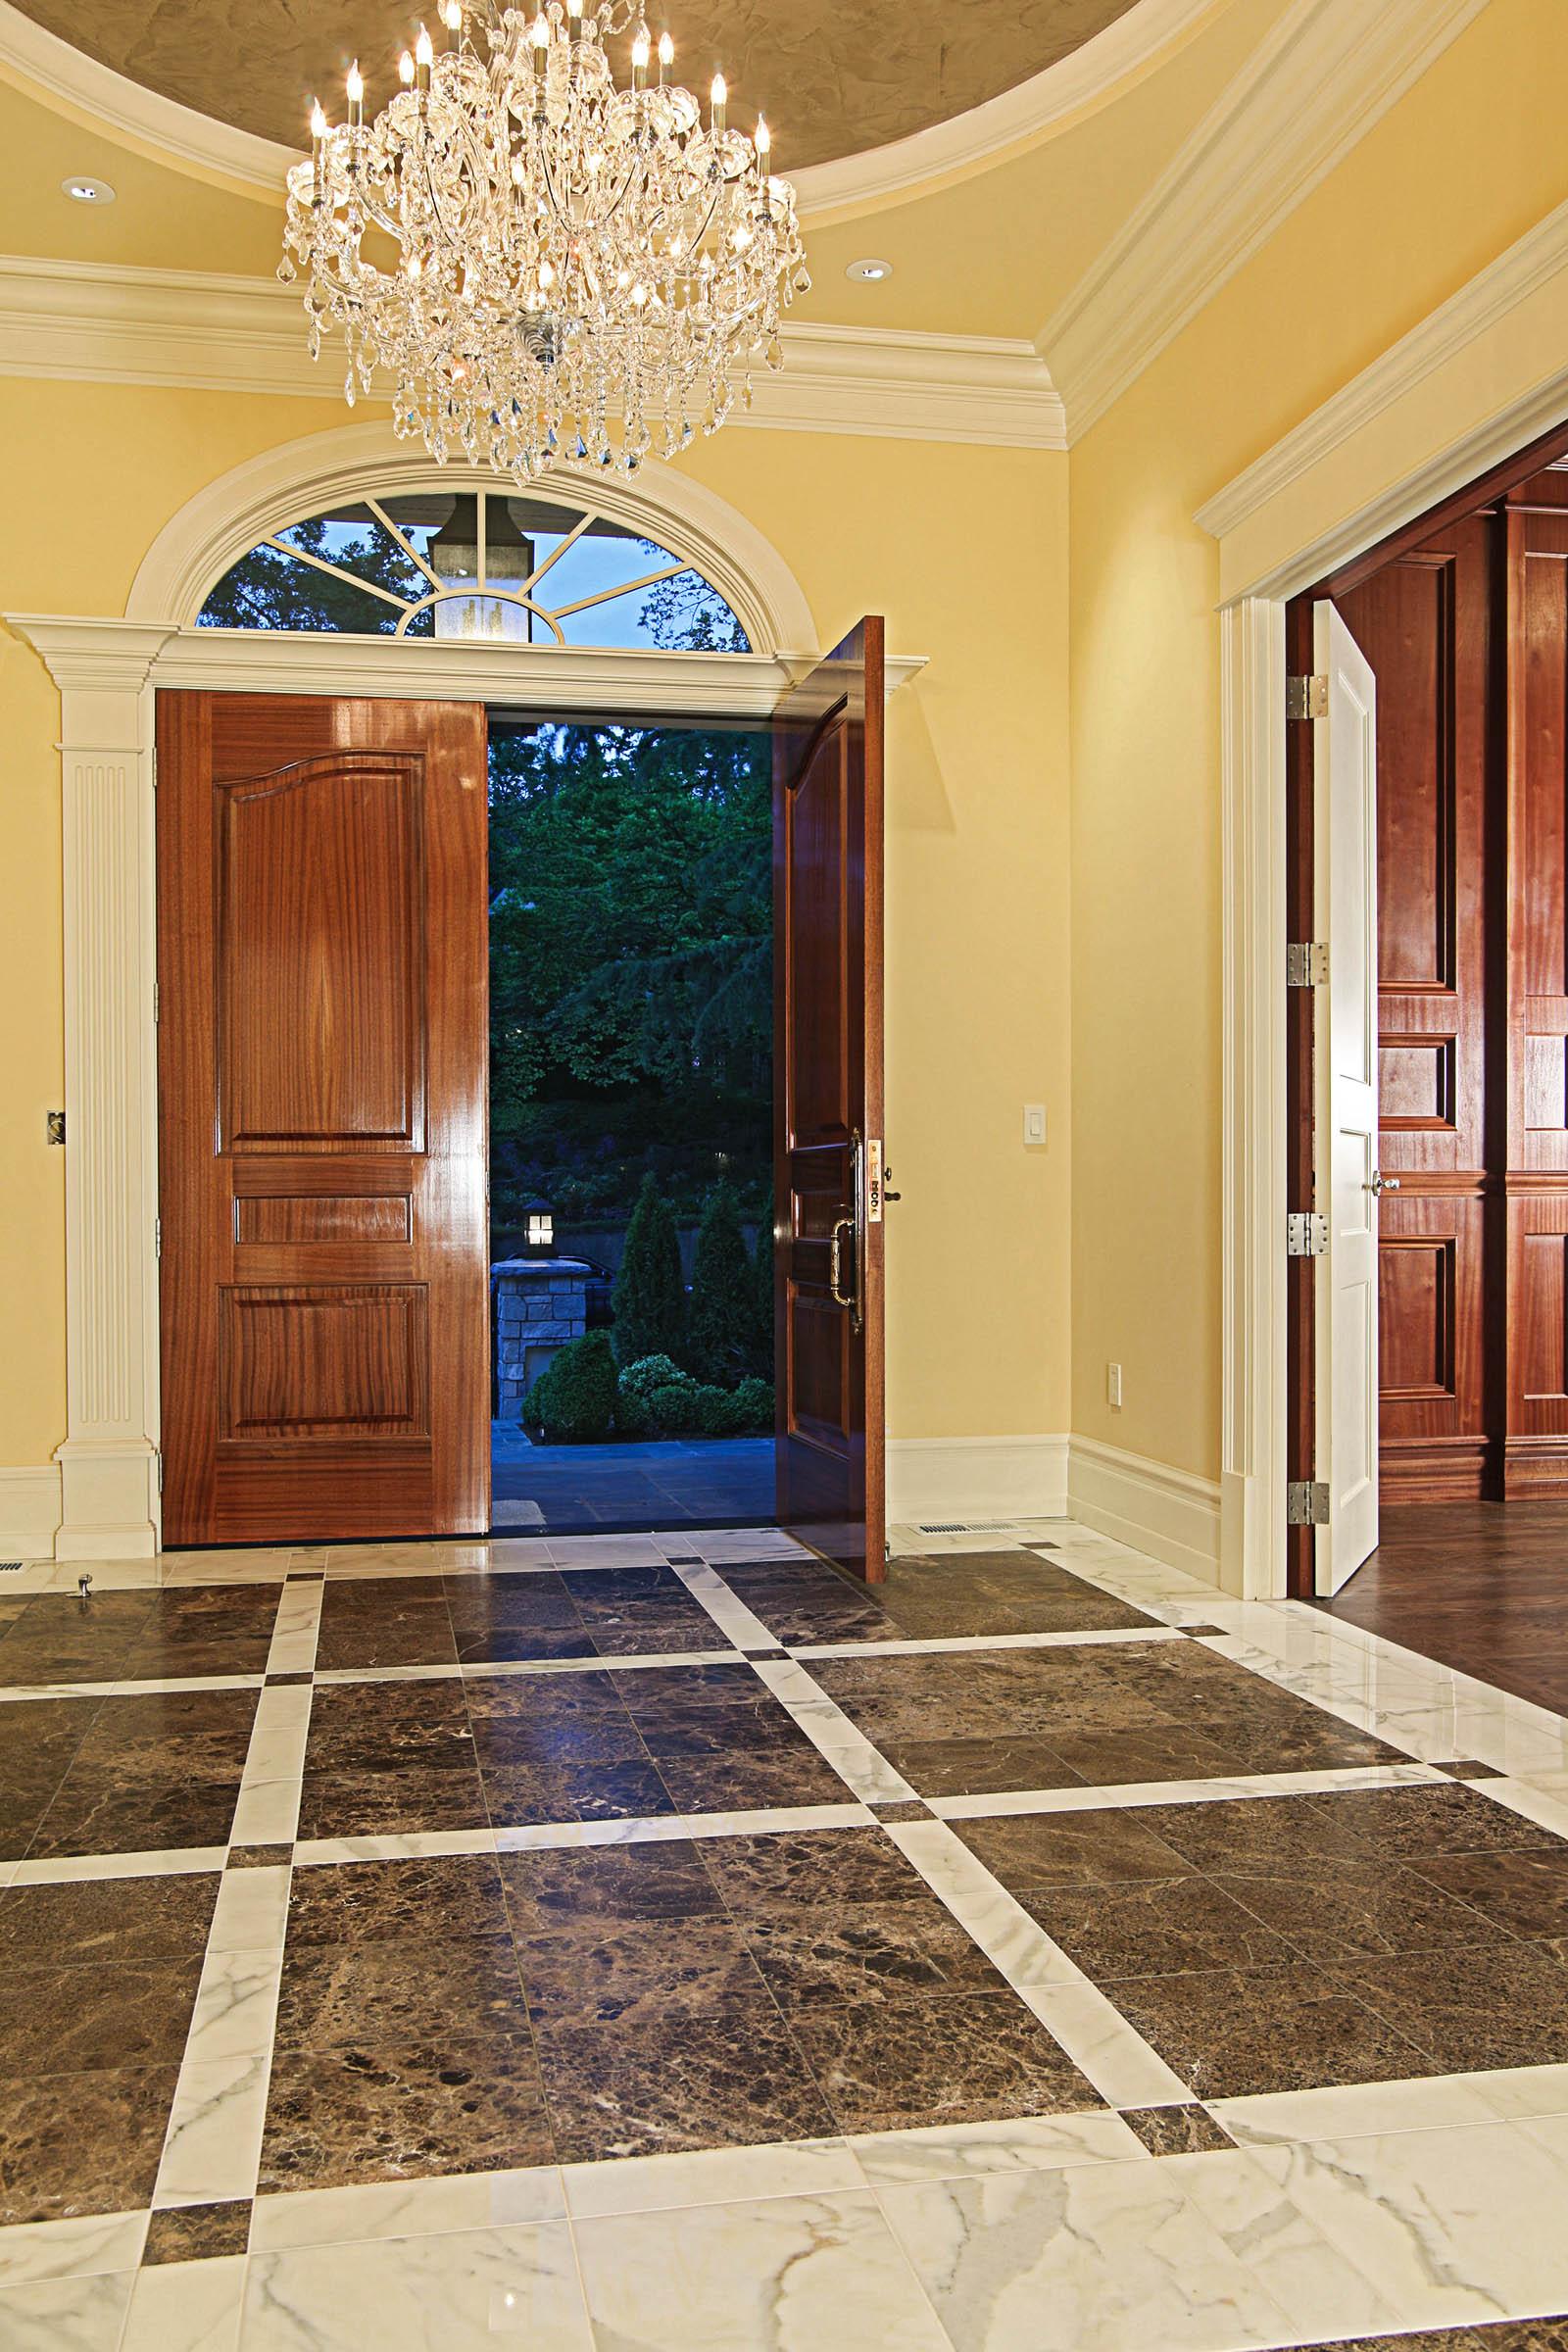 Entry Floor Photos Gallery  Seattle Tile Contractor  IRC